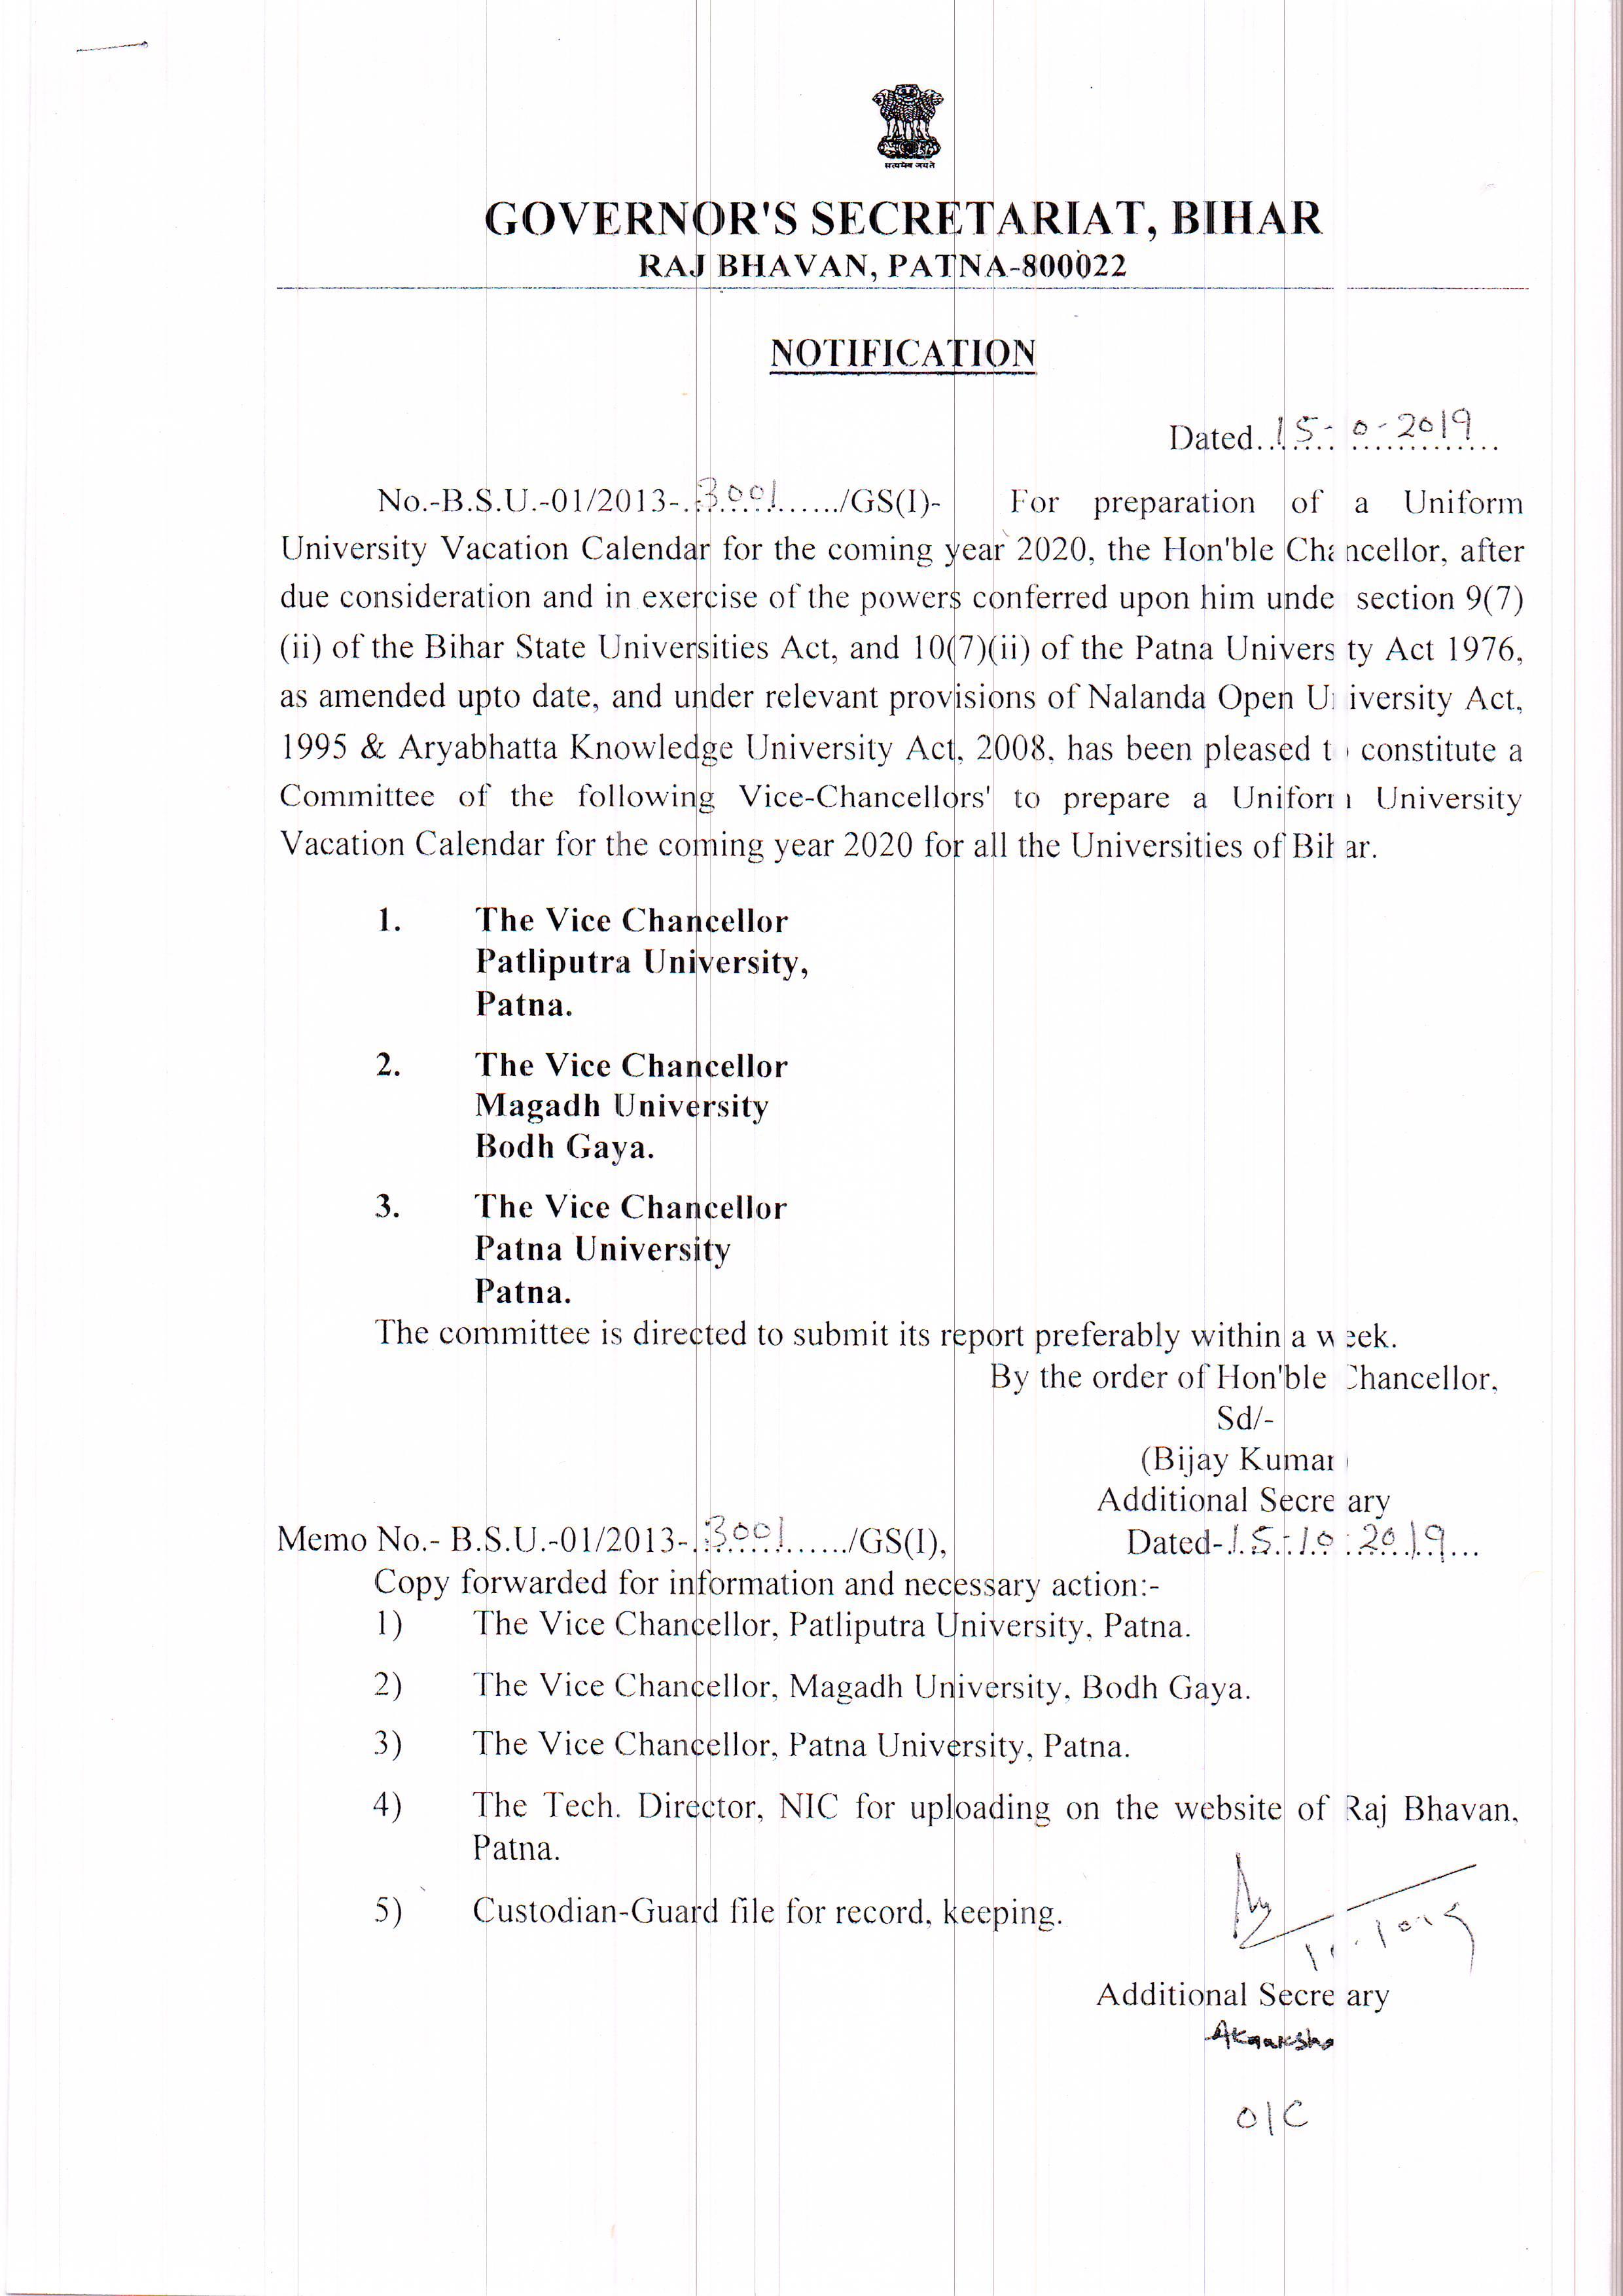 Governor Of Bihar in Bihar Govt 2020 Calendar